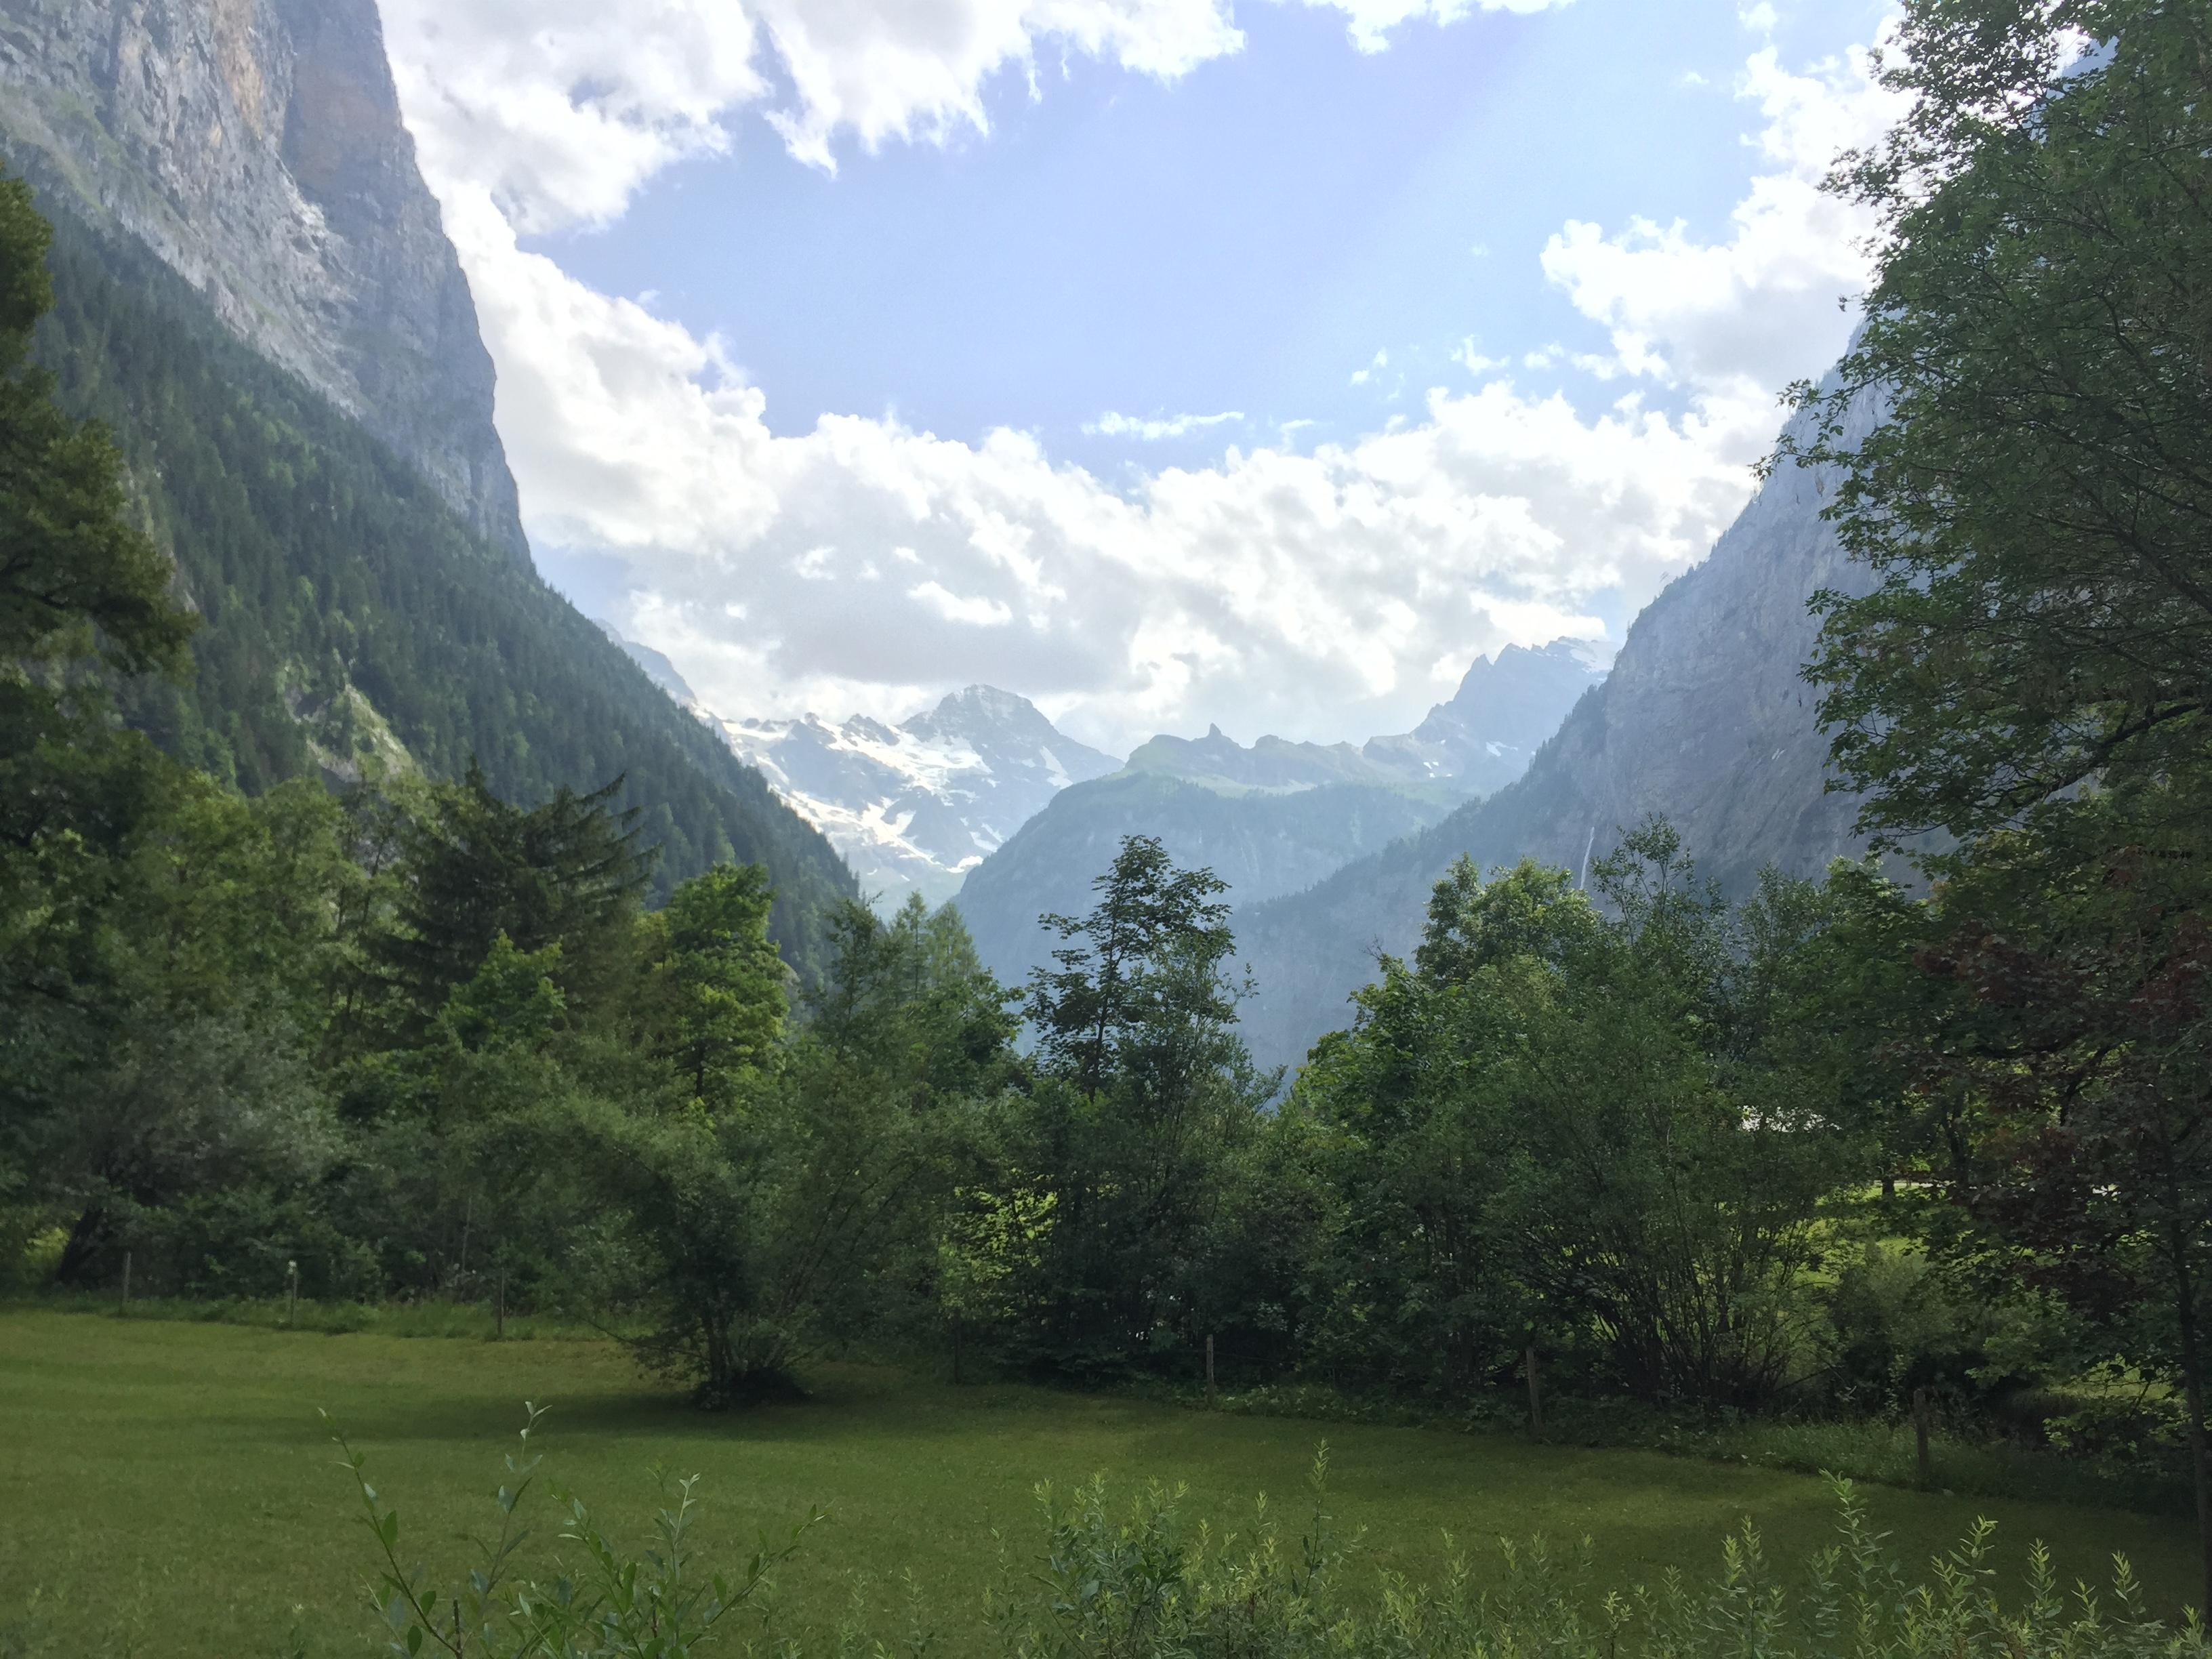 Snapshot of Lauterbrunnen valley